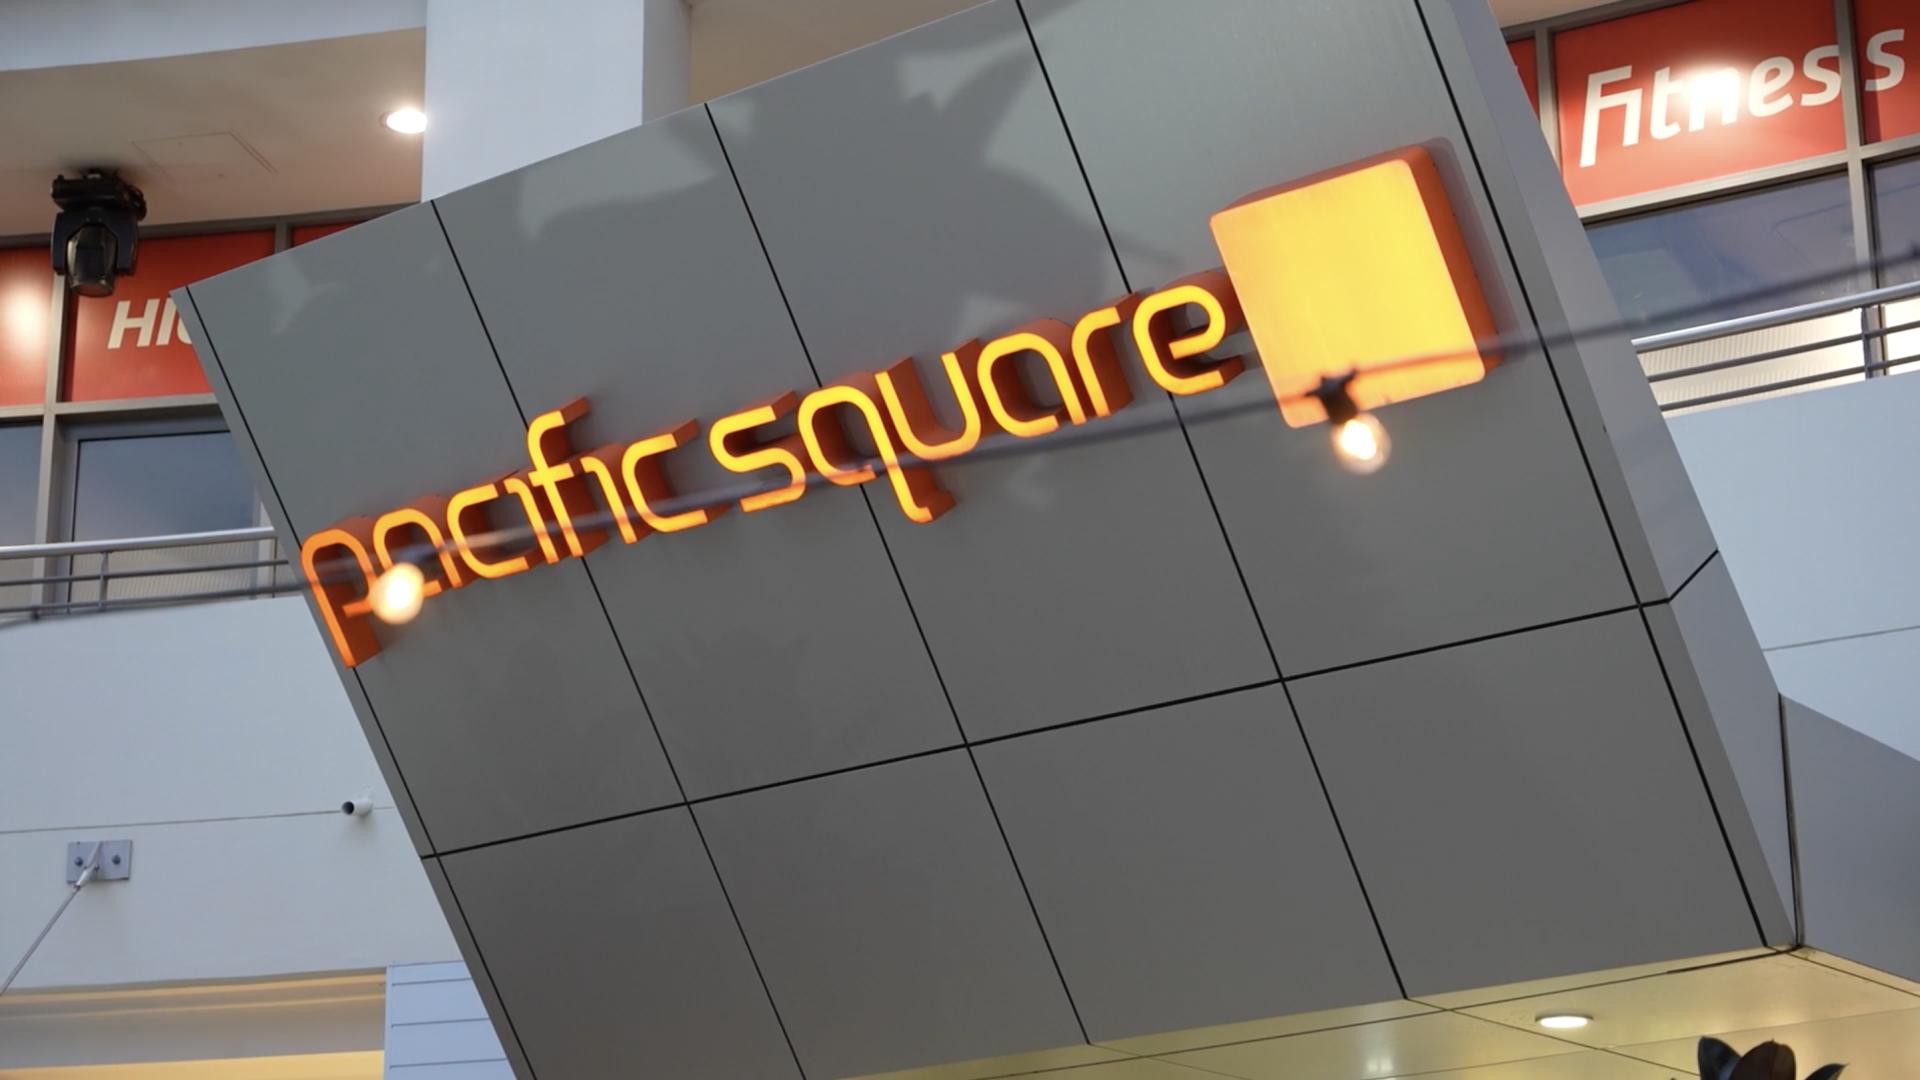 Pacific Square - Video Thumbnail